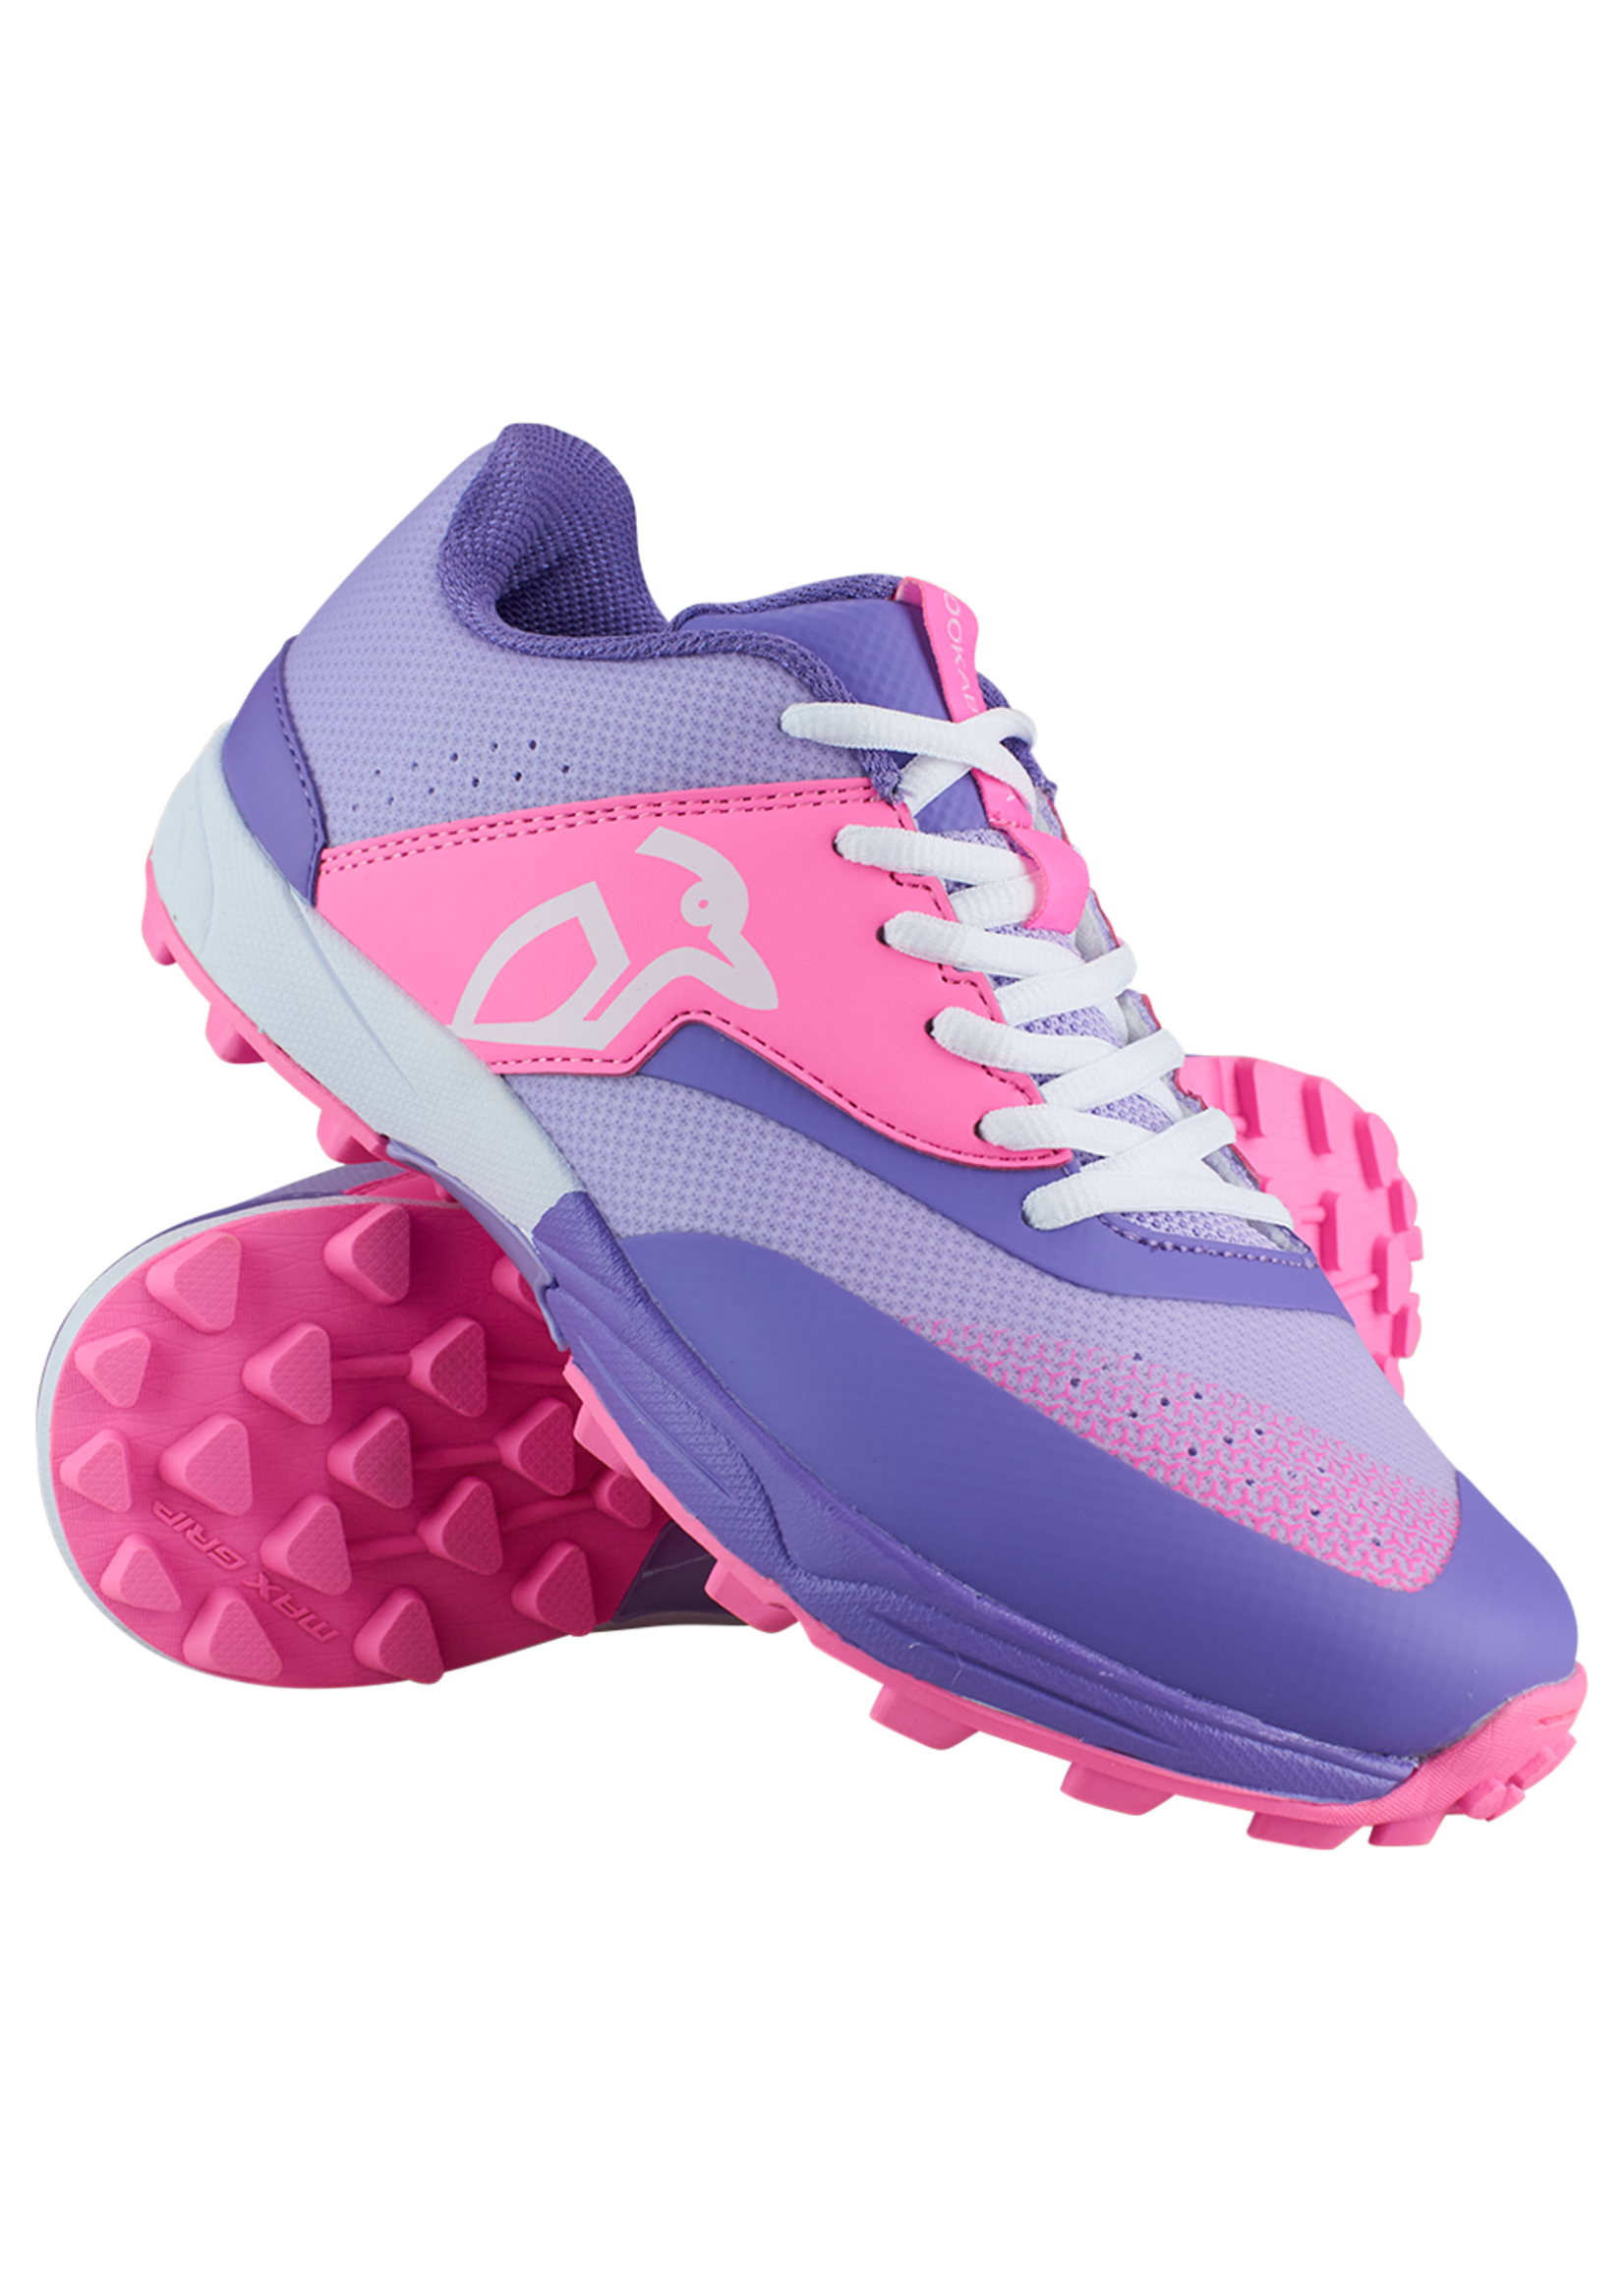 Kookaburra Kookaburra Dusk Ladies Hockey Shoe (2019)